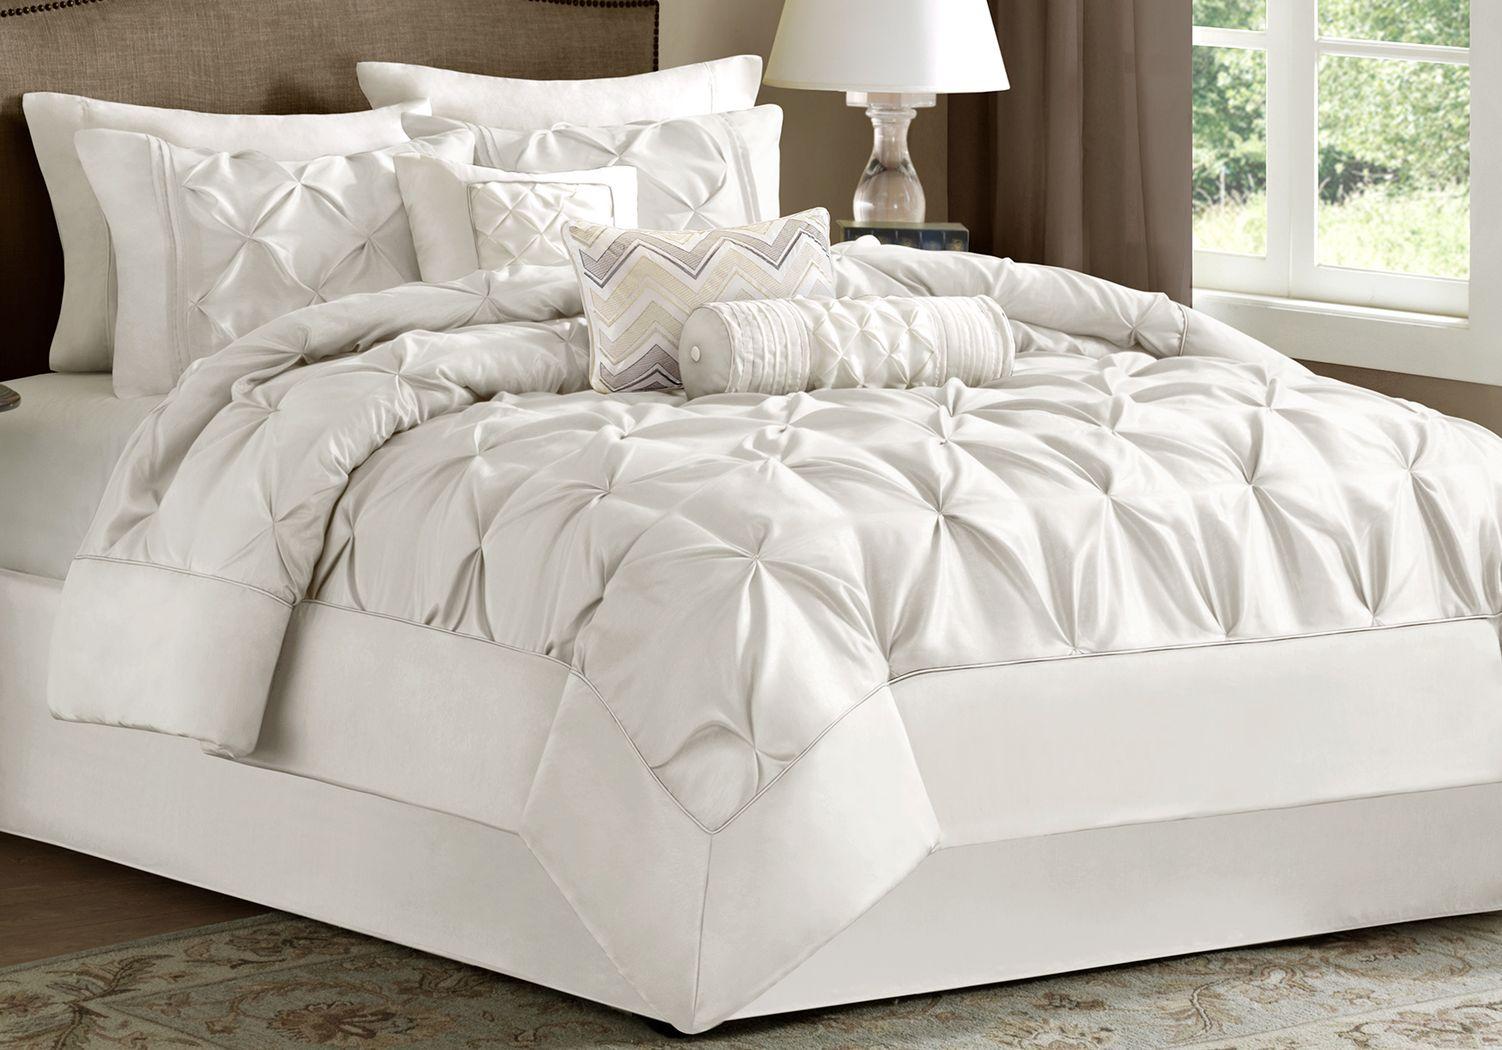 Janelle White 7 Pc Queen Comforter Set